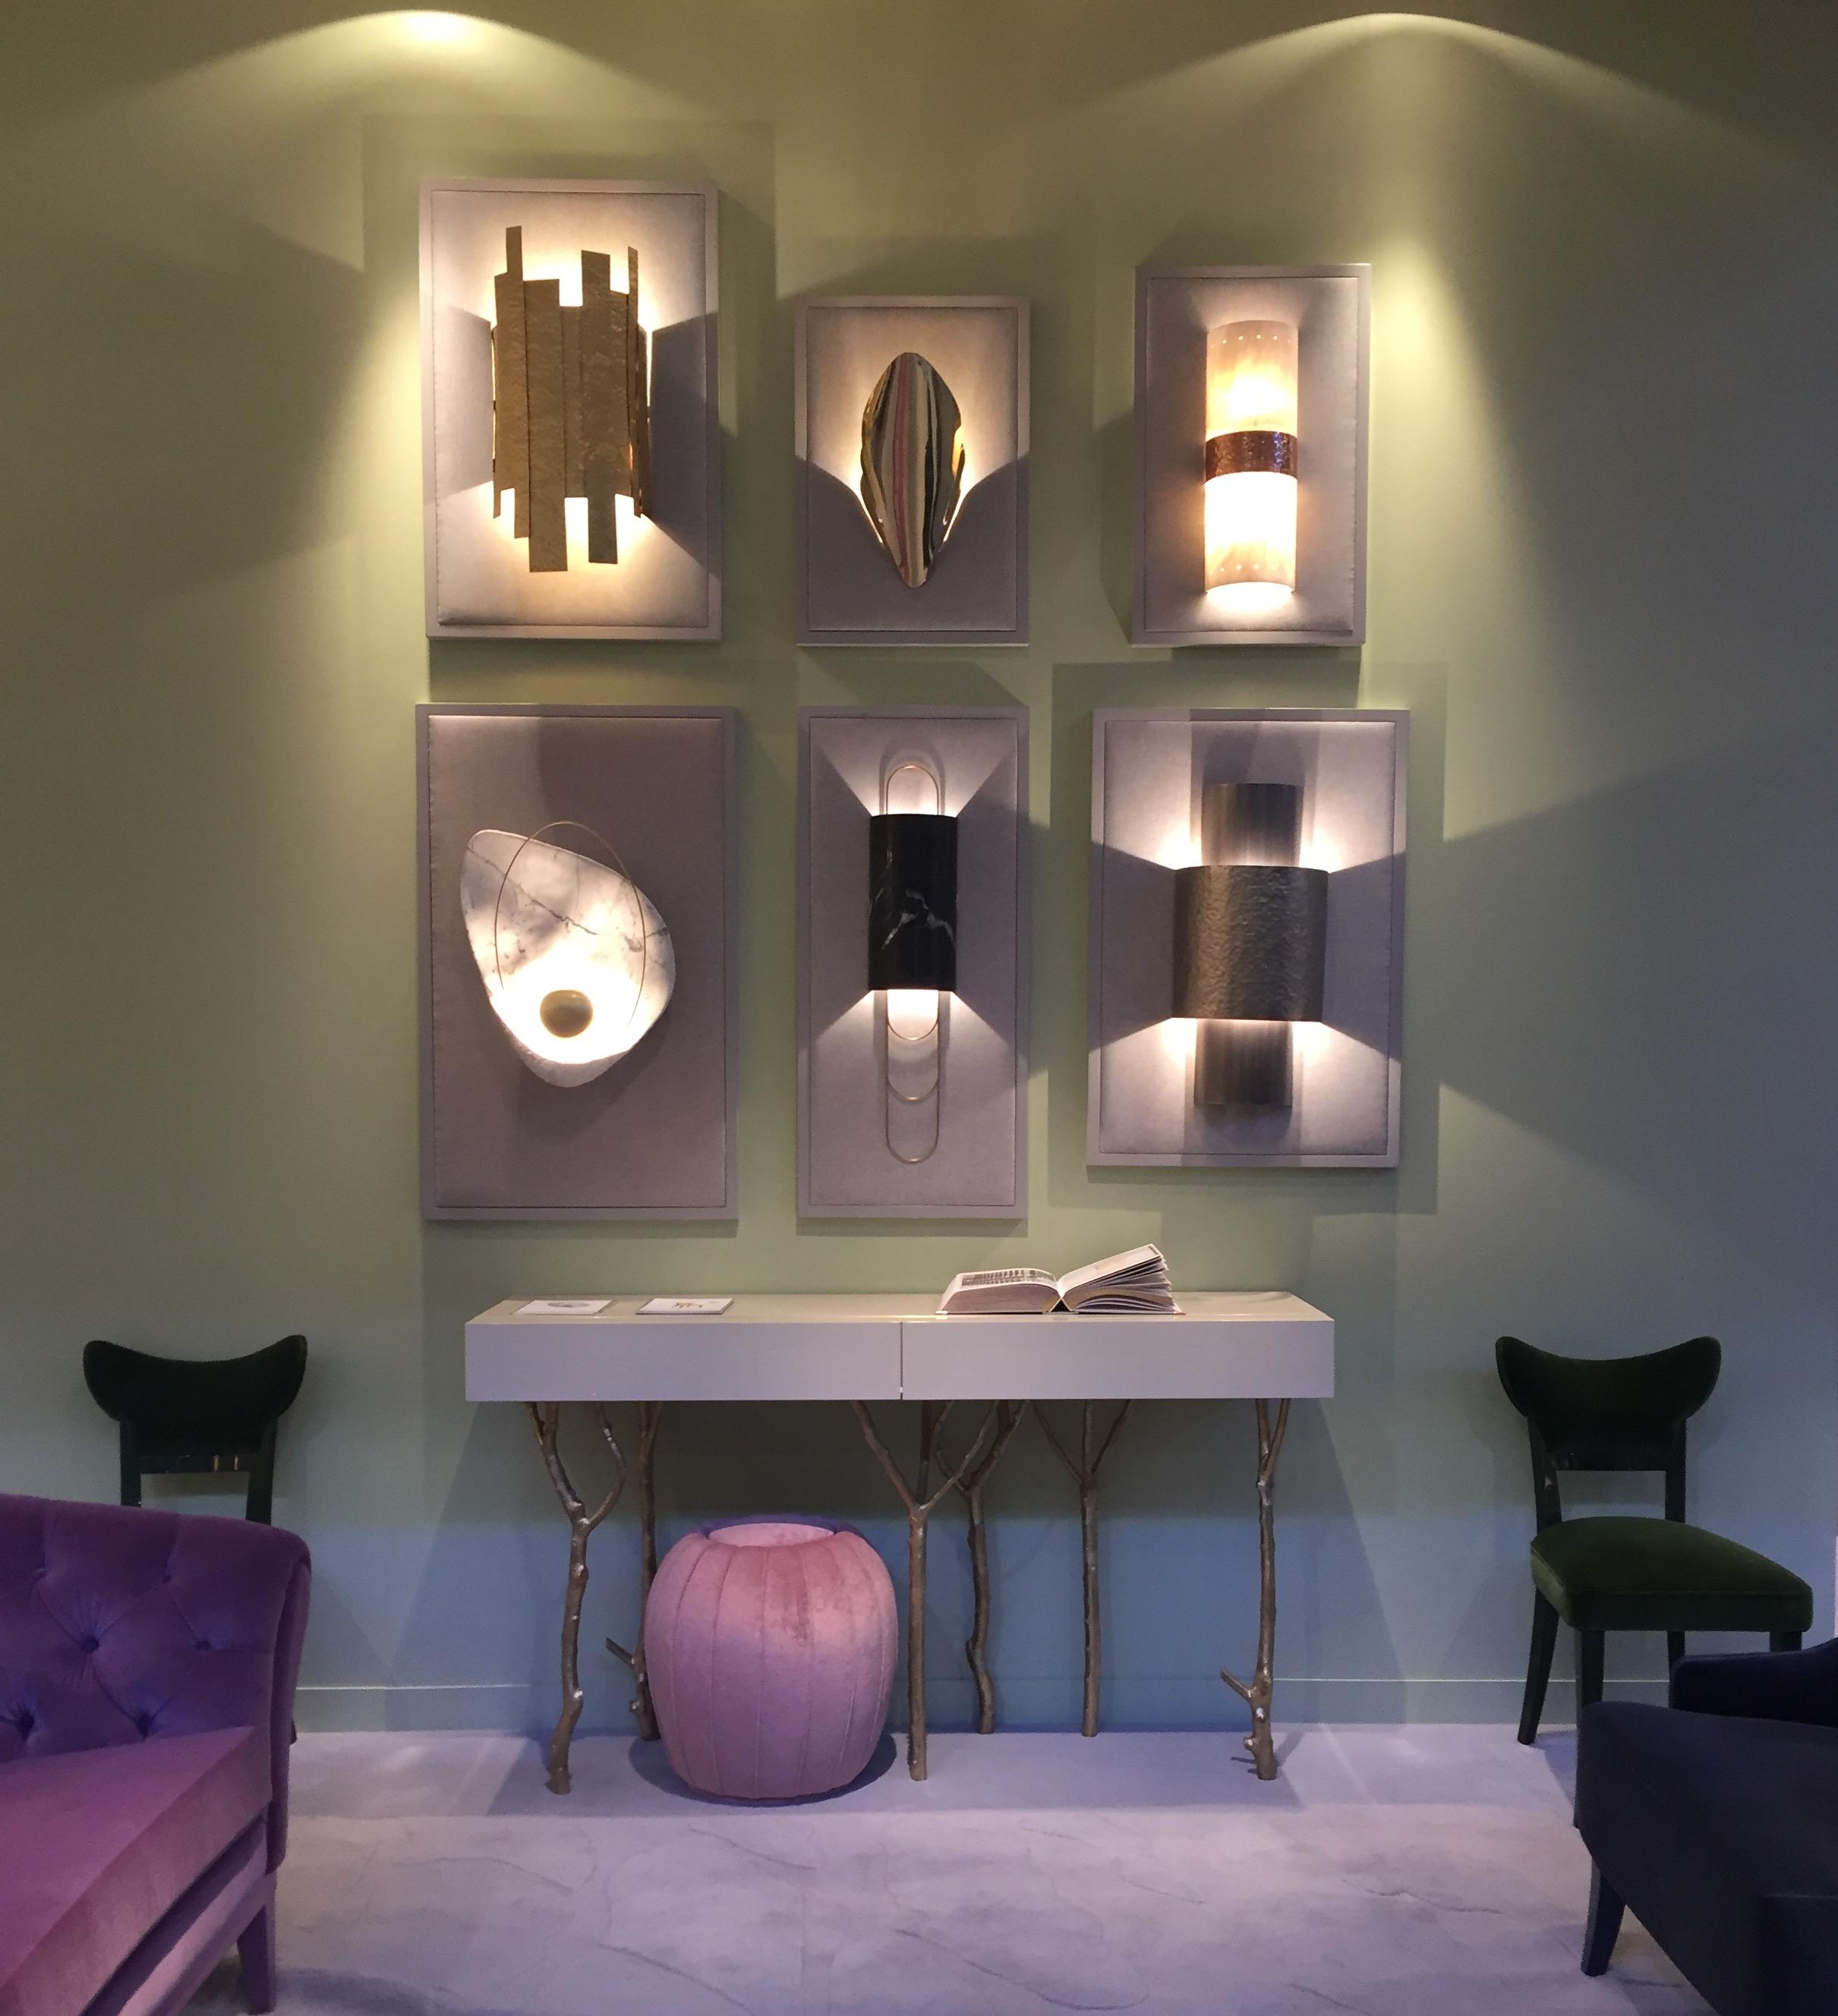 Maison&Objet 2016 September edition - Lighting inspiration | Masha Shapiro Agency.jpg